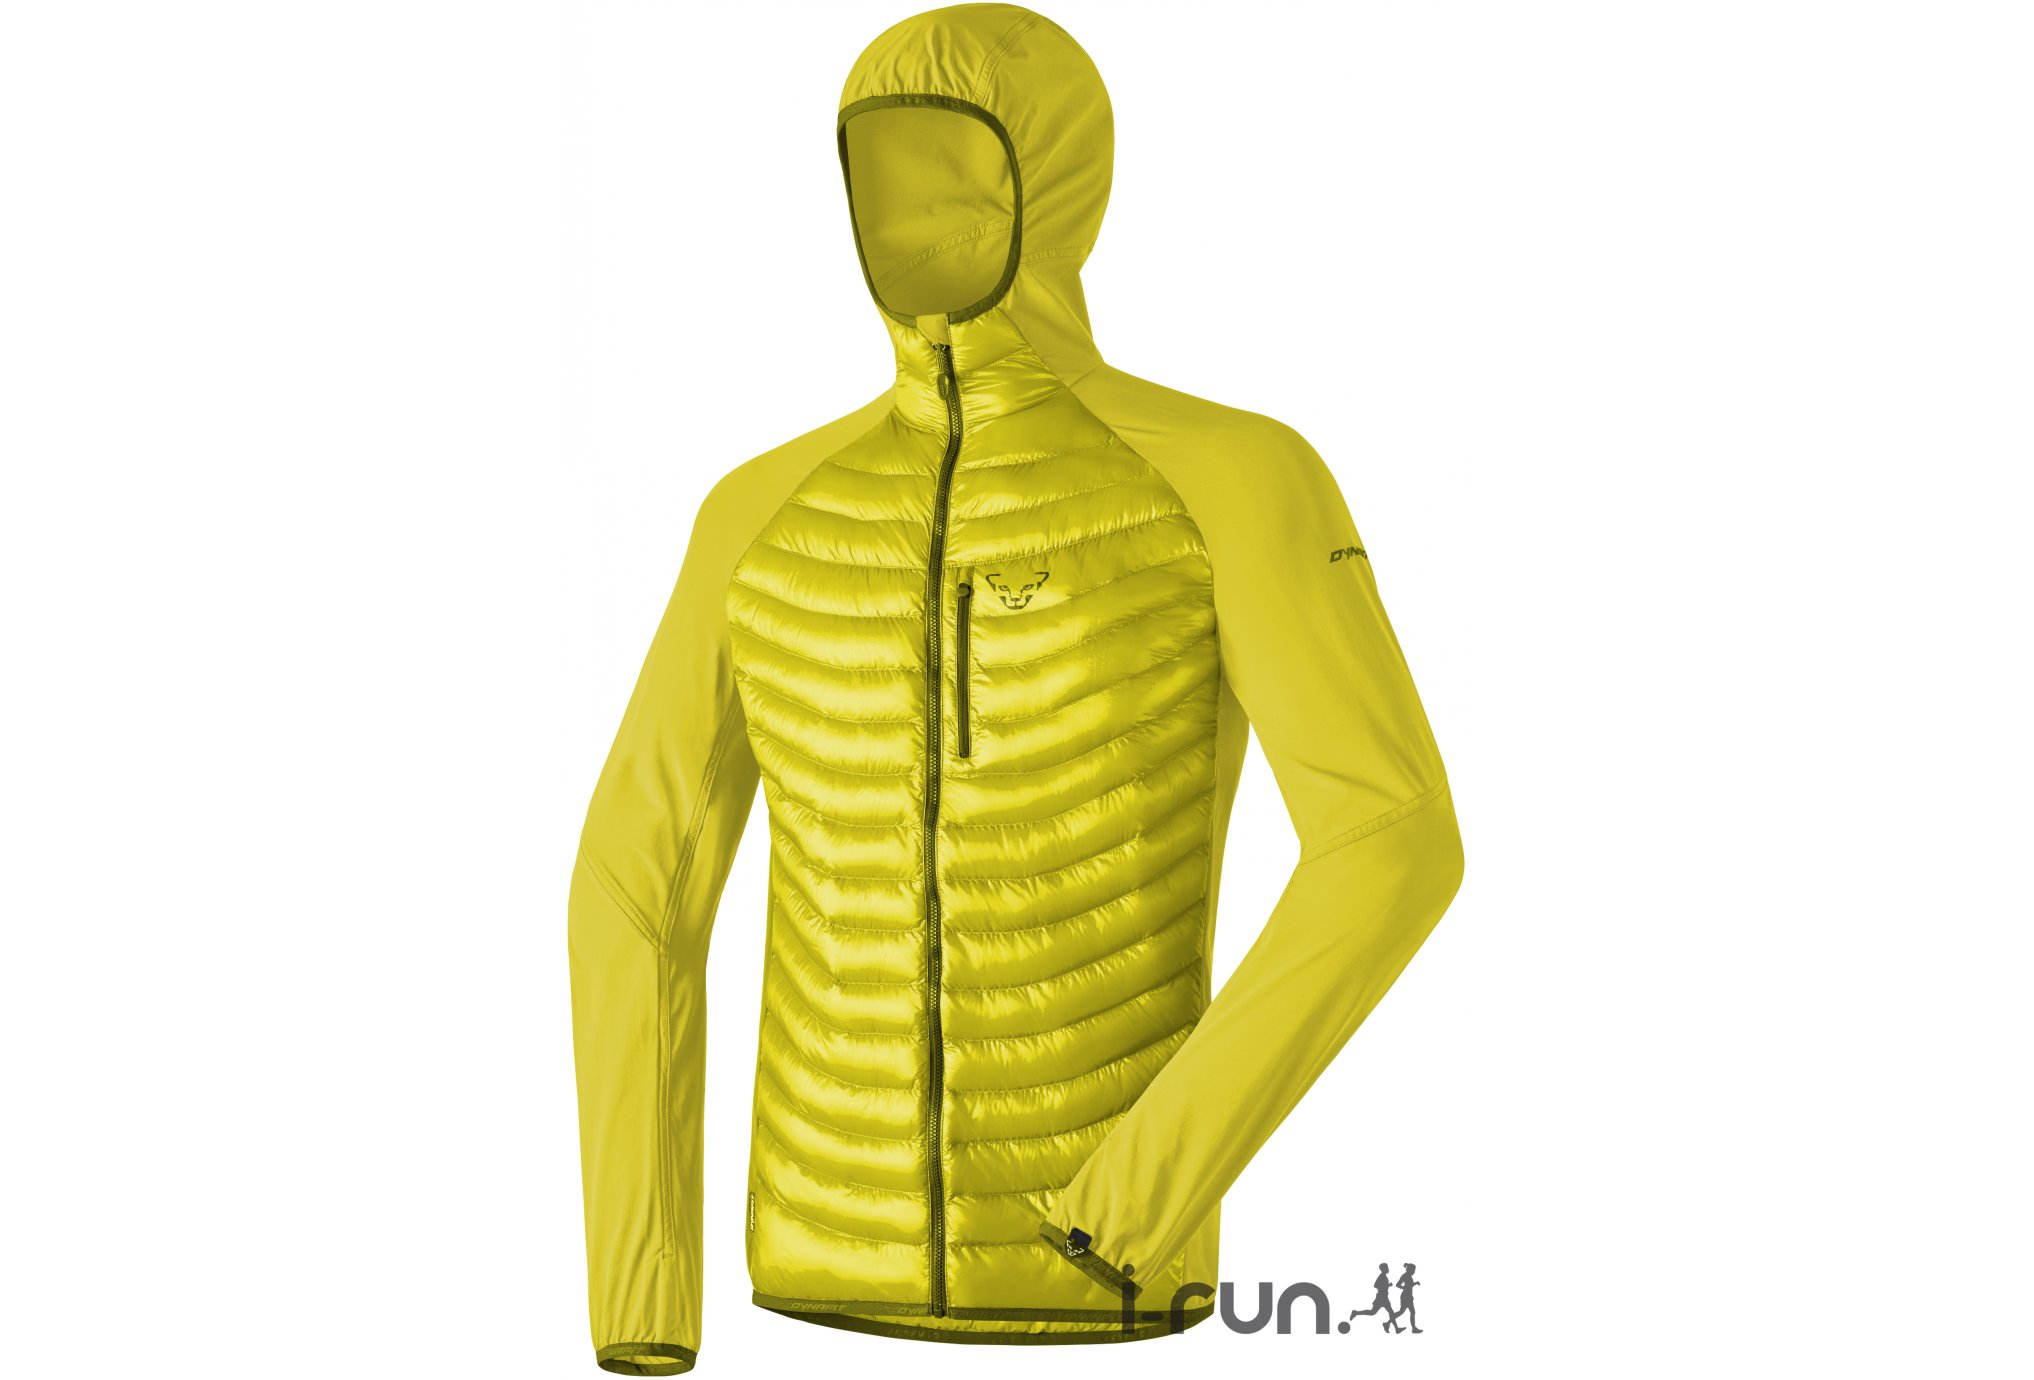 Dynafit veste traverse hybrid m pas cher destockage dynafit running veste t - Avis destockage fitness ...